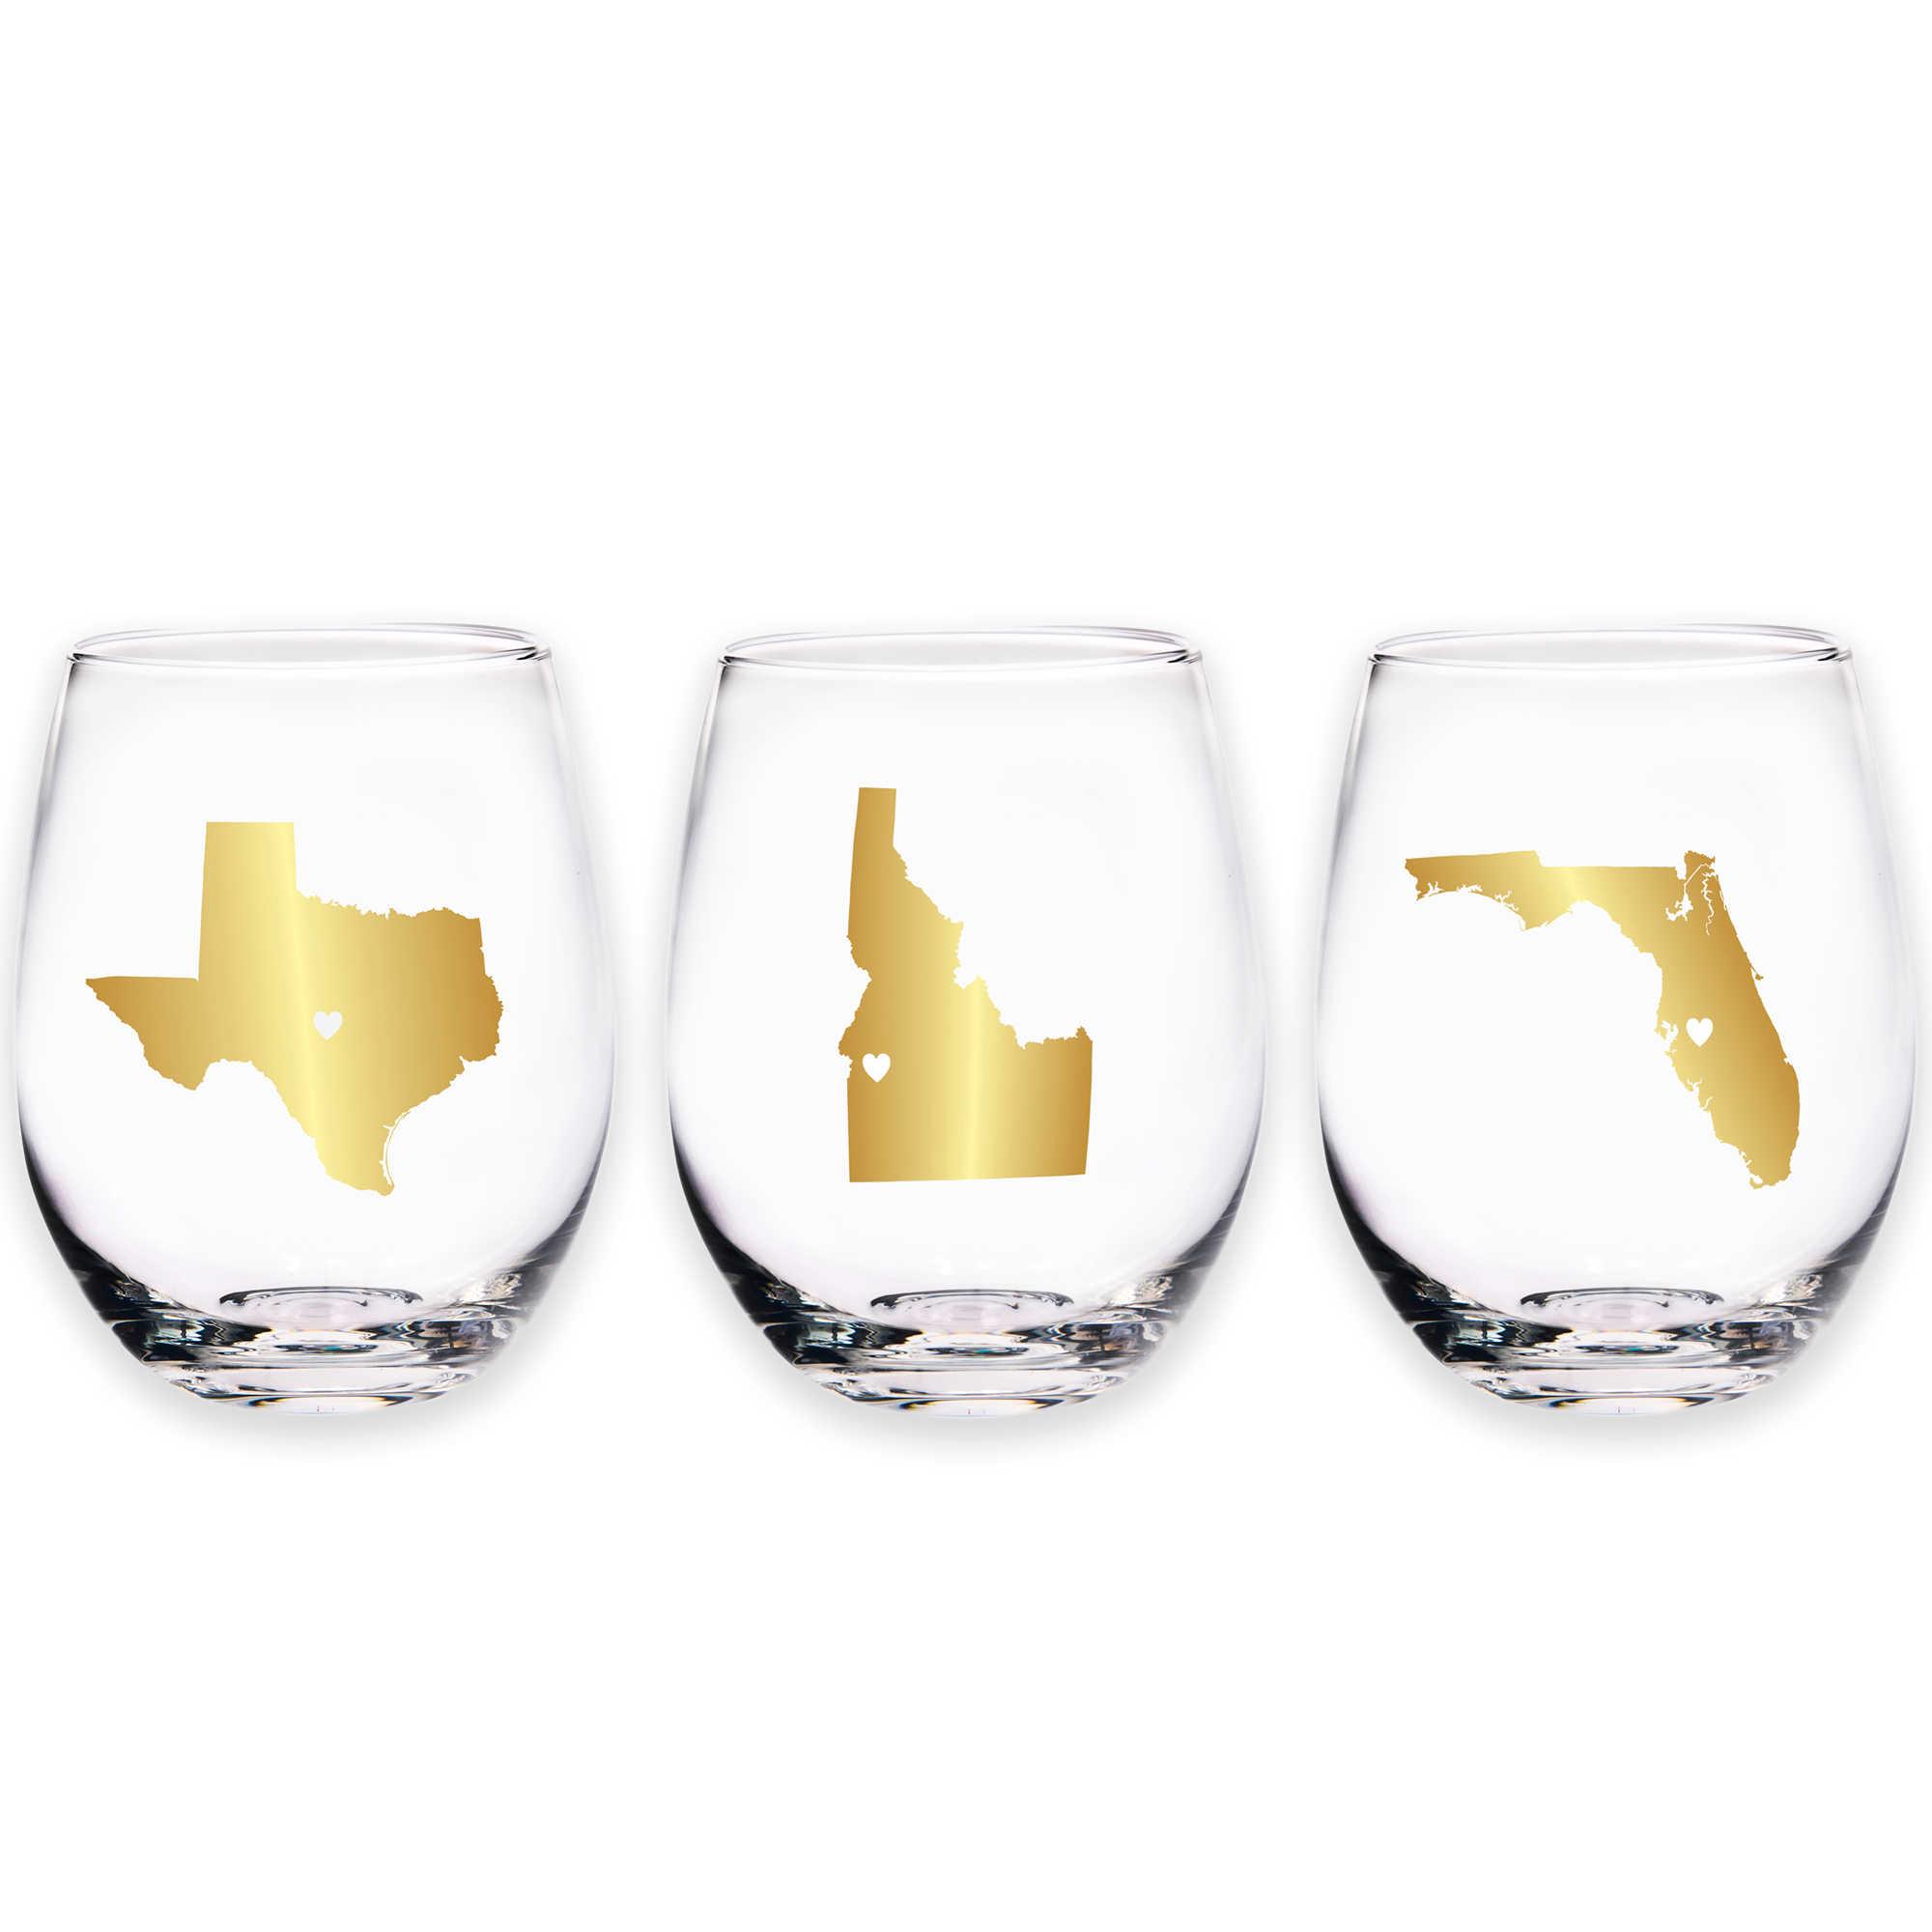 Home Essentials & Beyond Map Stemless Wine Glass - Bed Bath & Beyond